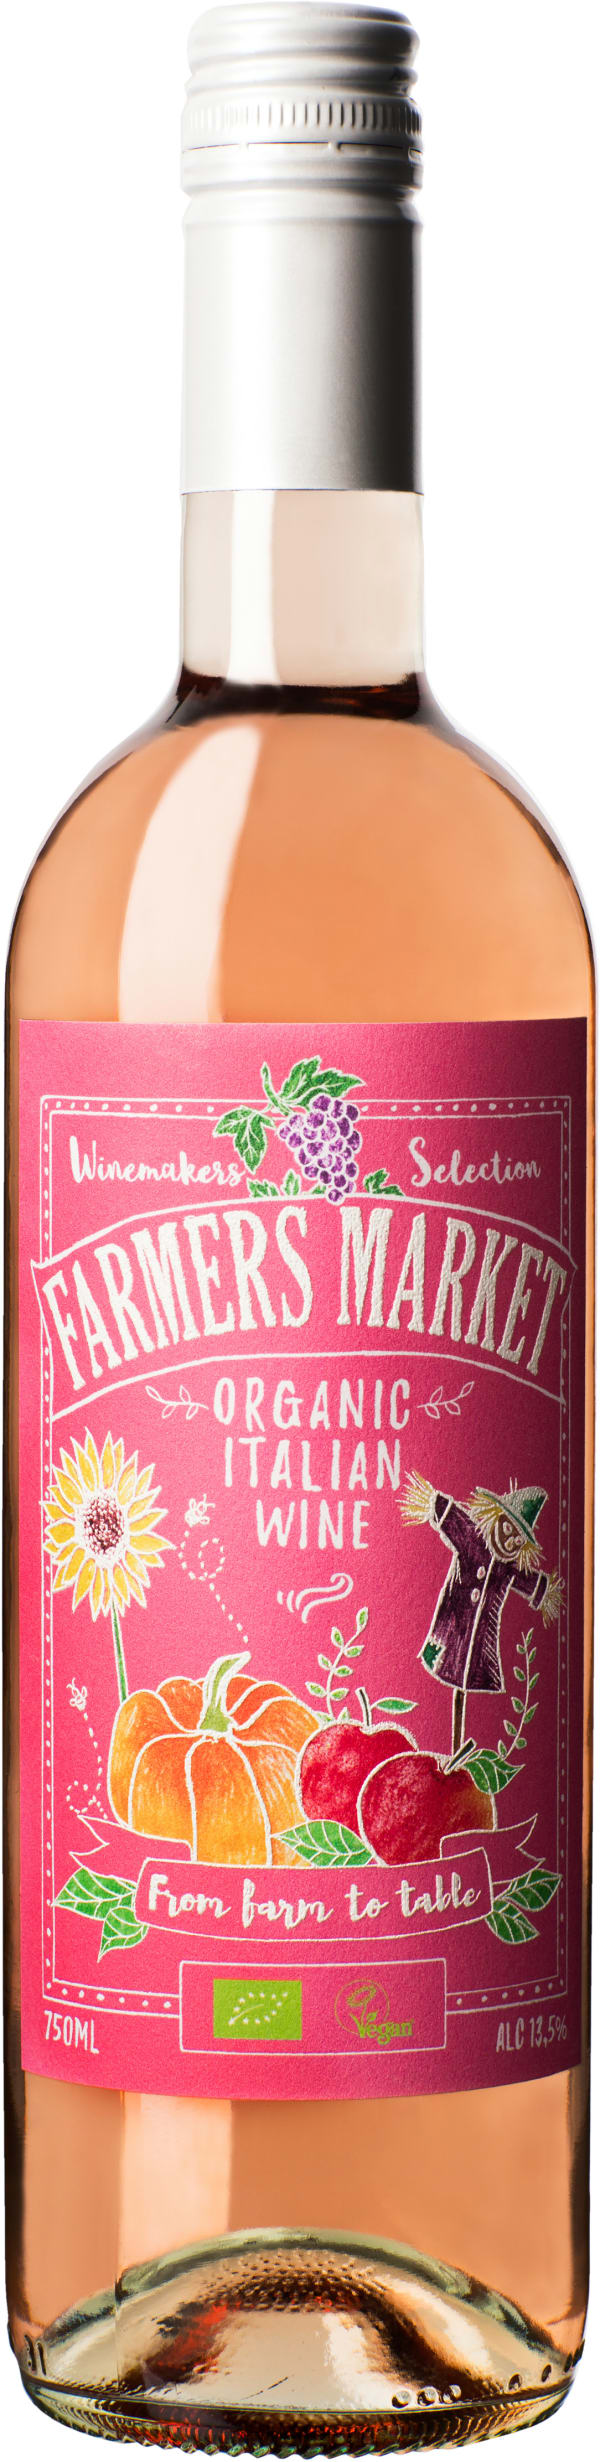 Farmers Market Organic Rosé